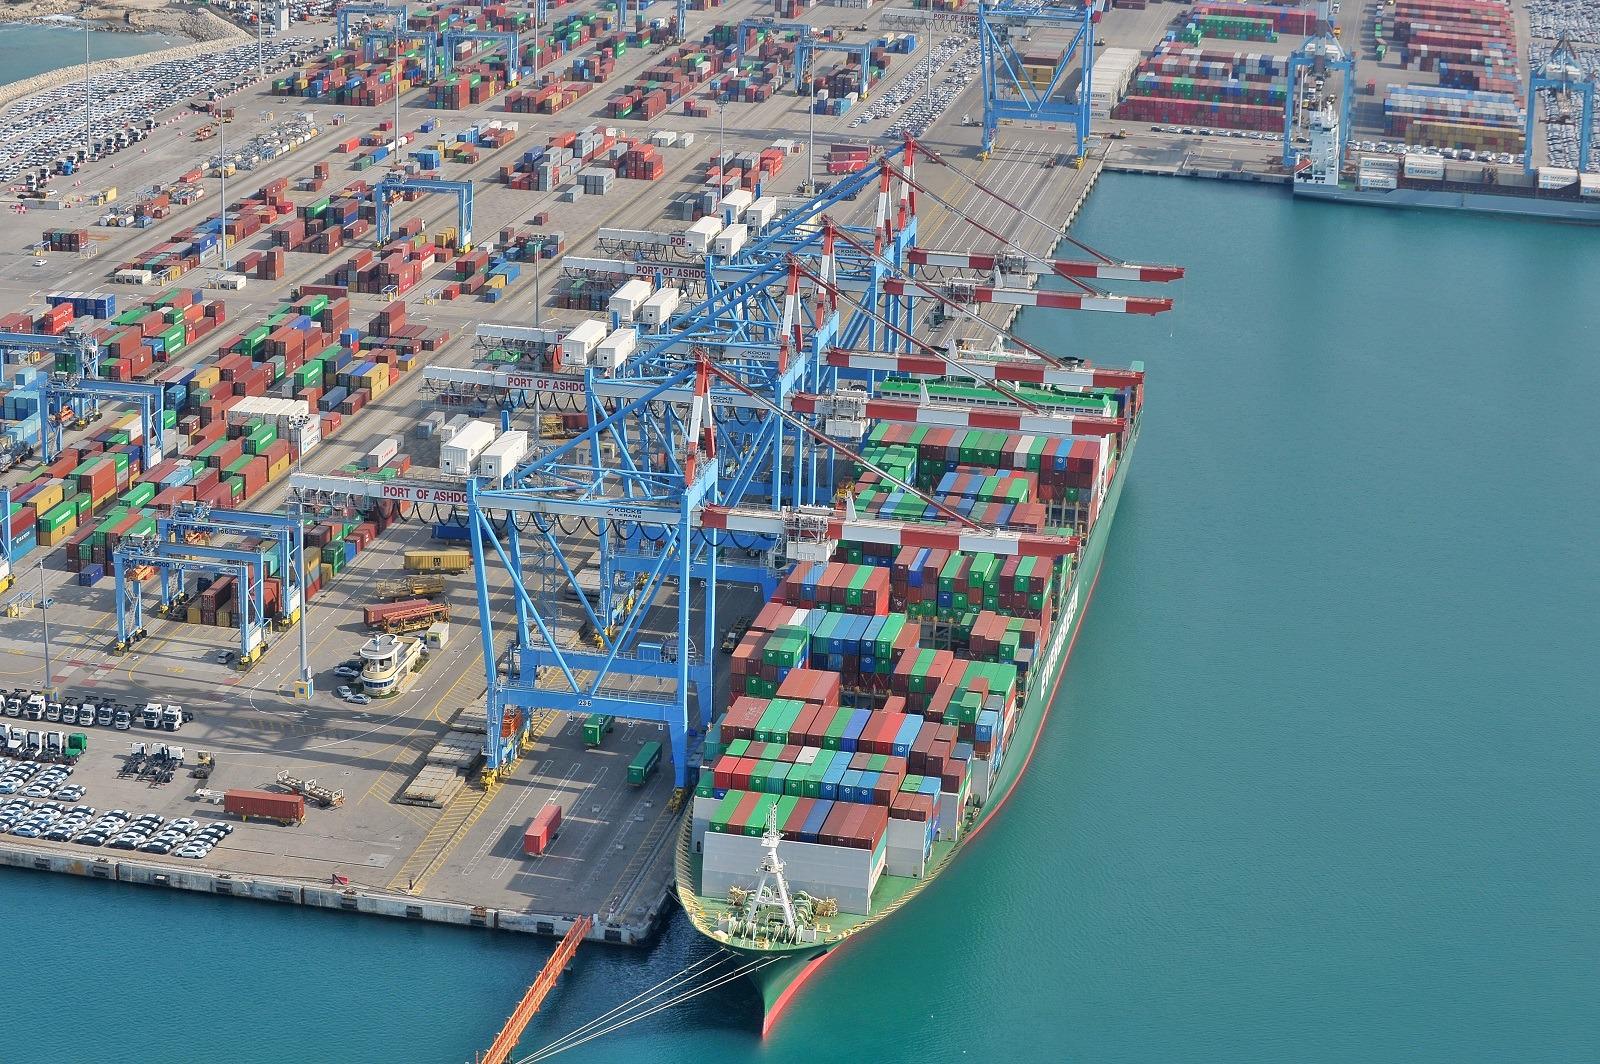 Aerial view Ashdod port